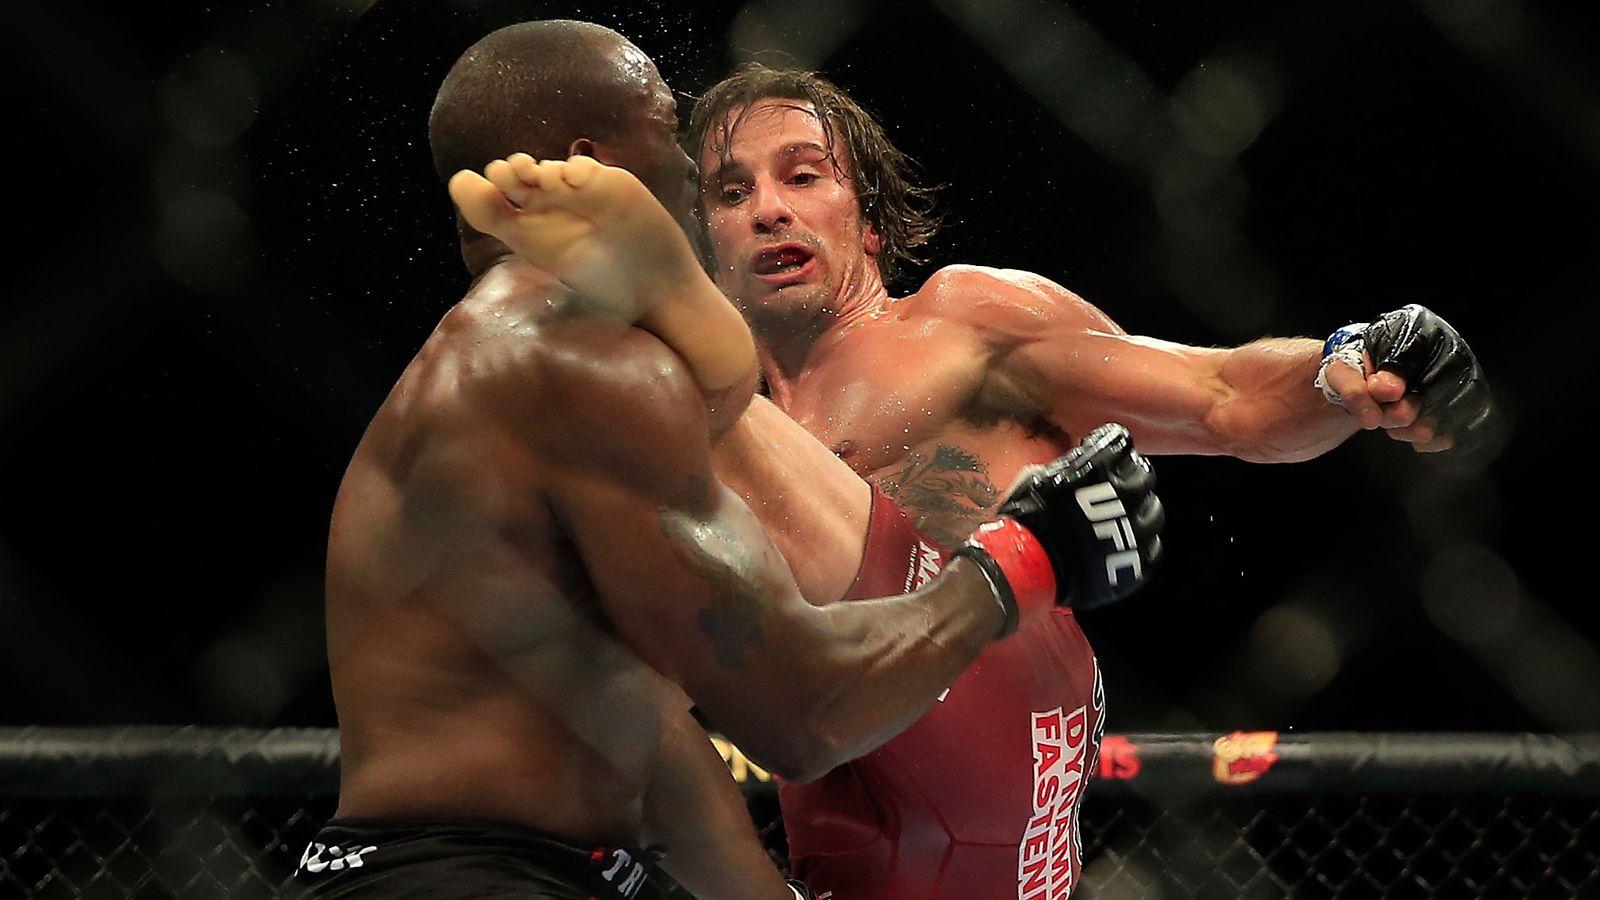 Watch Josh Samman knockout Eddie Gordon with brutal head kick at UFC 181 last night  MMAmaniacom